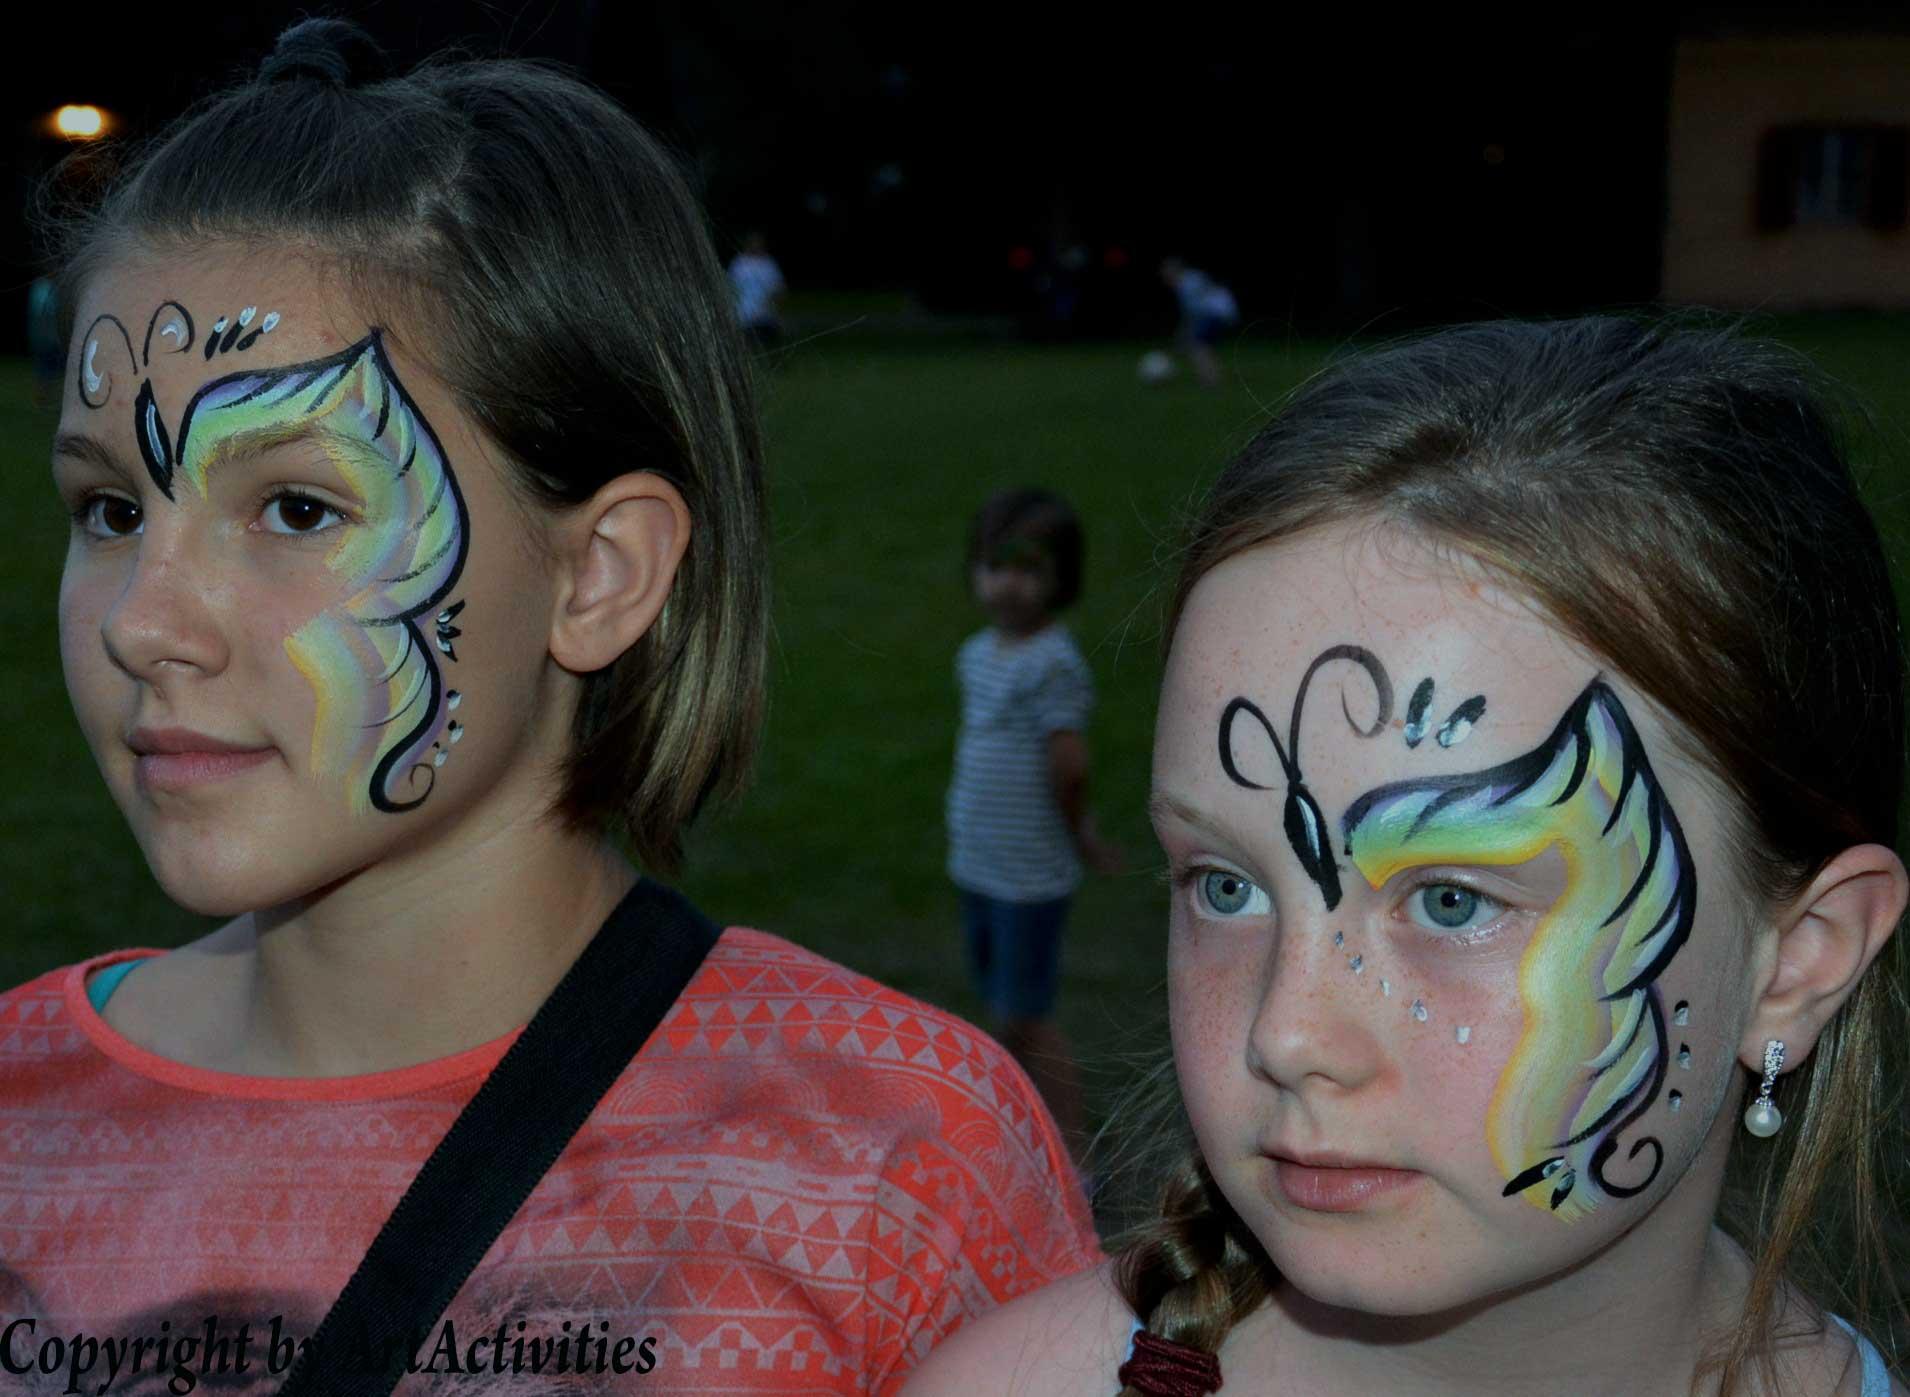 Kinderschminken/Facepainting Schmetterling